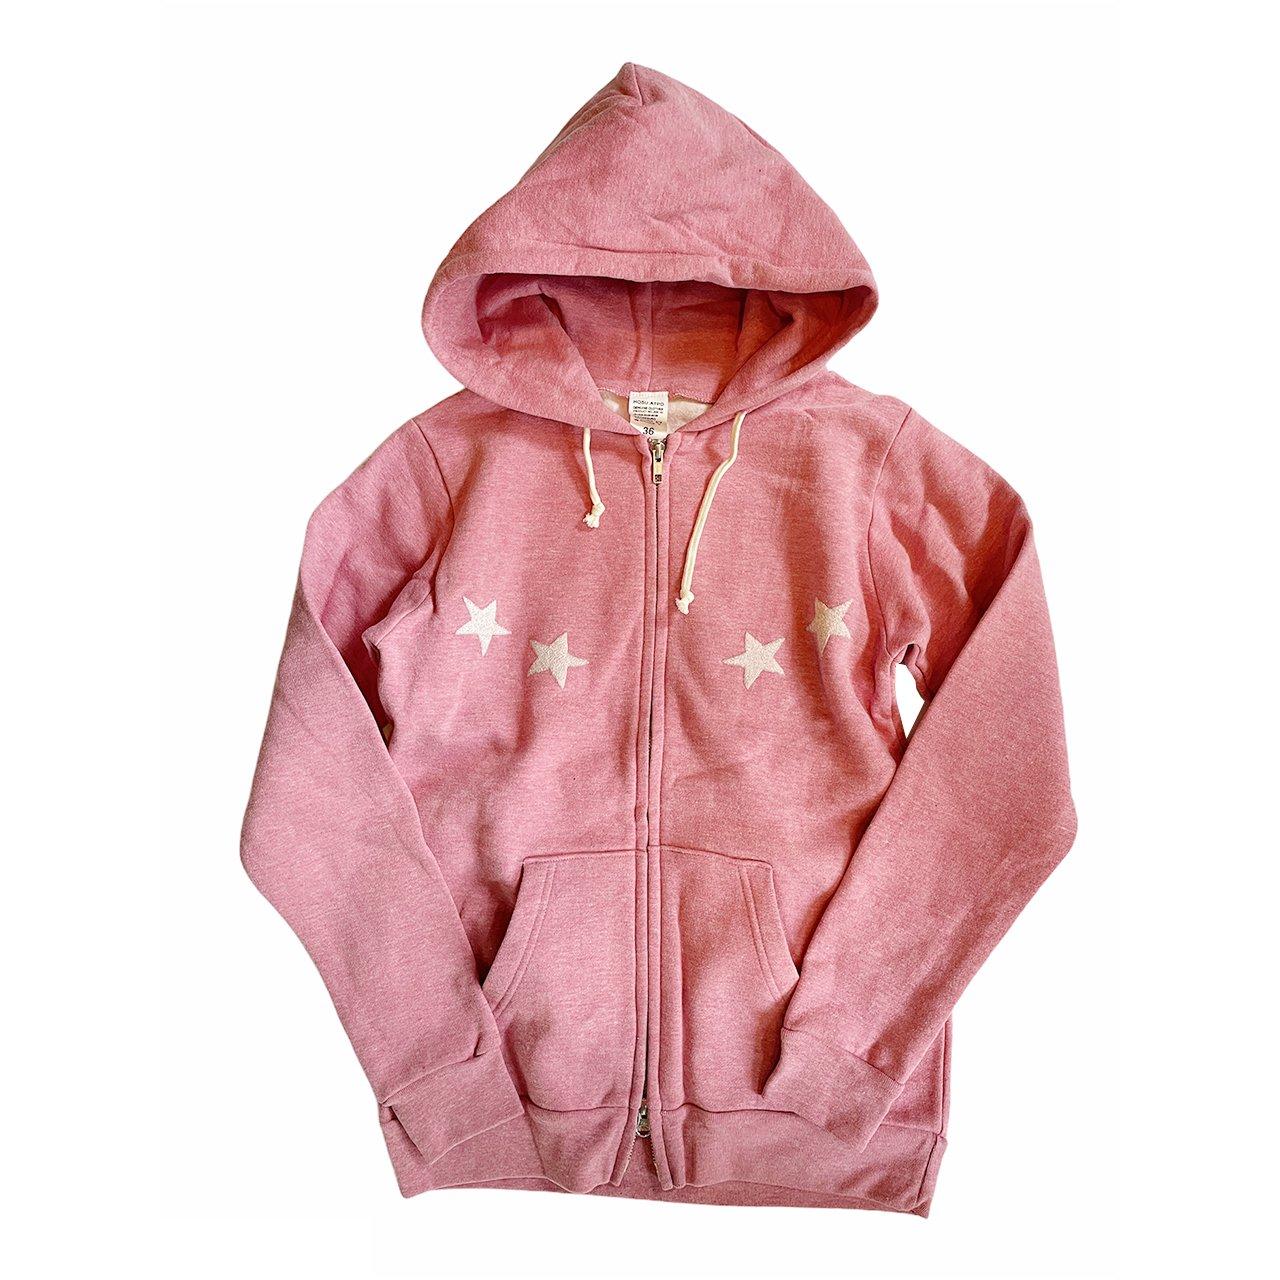 《30%OFF》HOSU 手刺繍プリントZIP-UPパーカー/ピンク